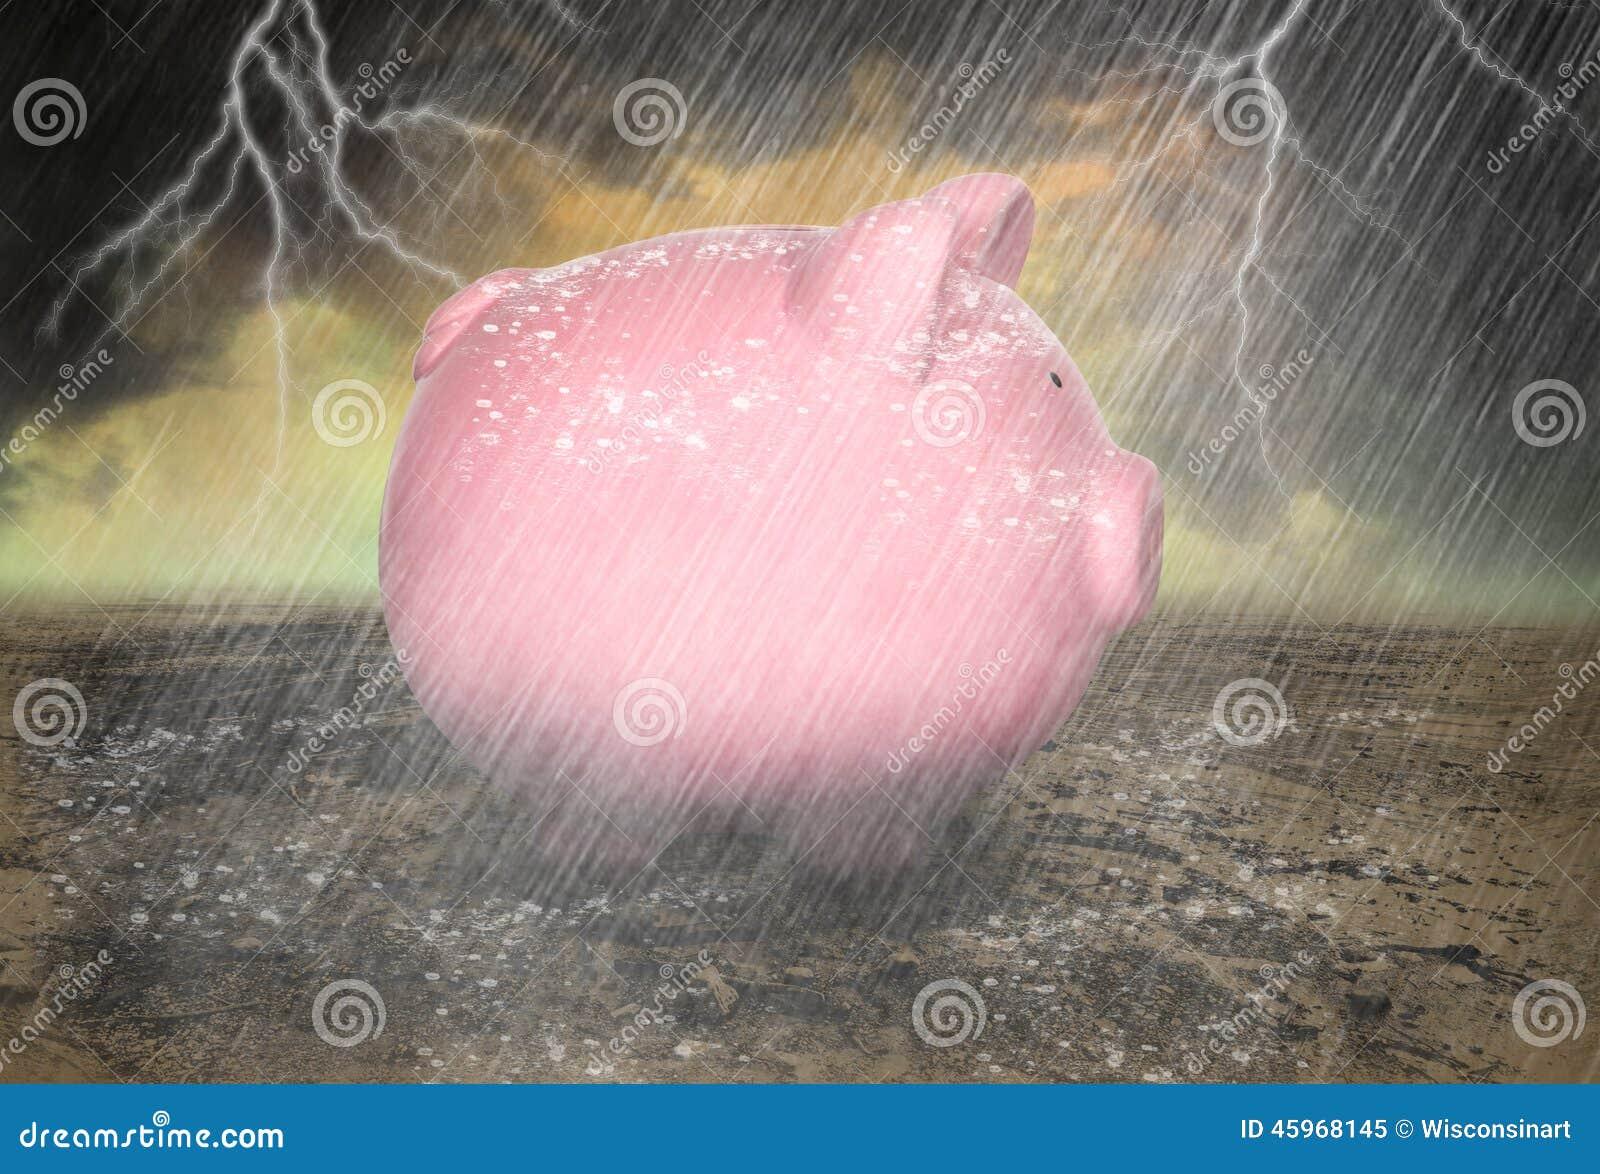 Saving, Save Money Rainy Day